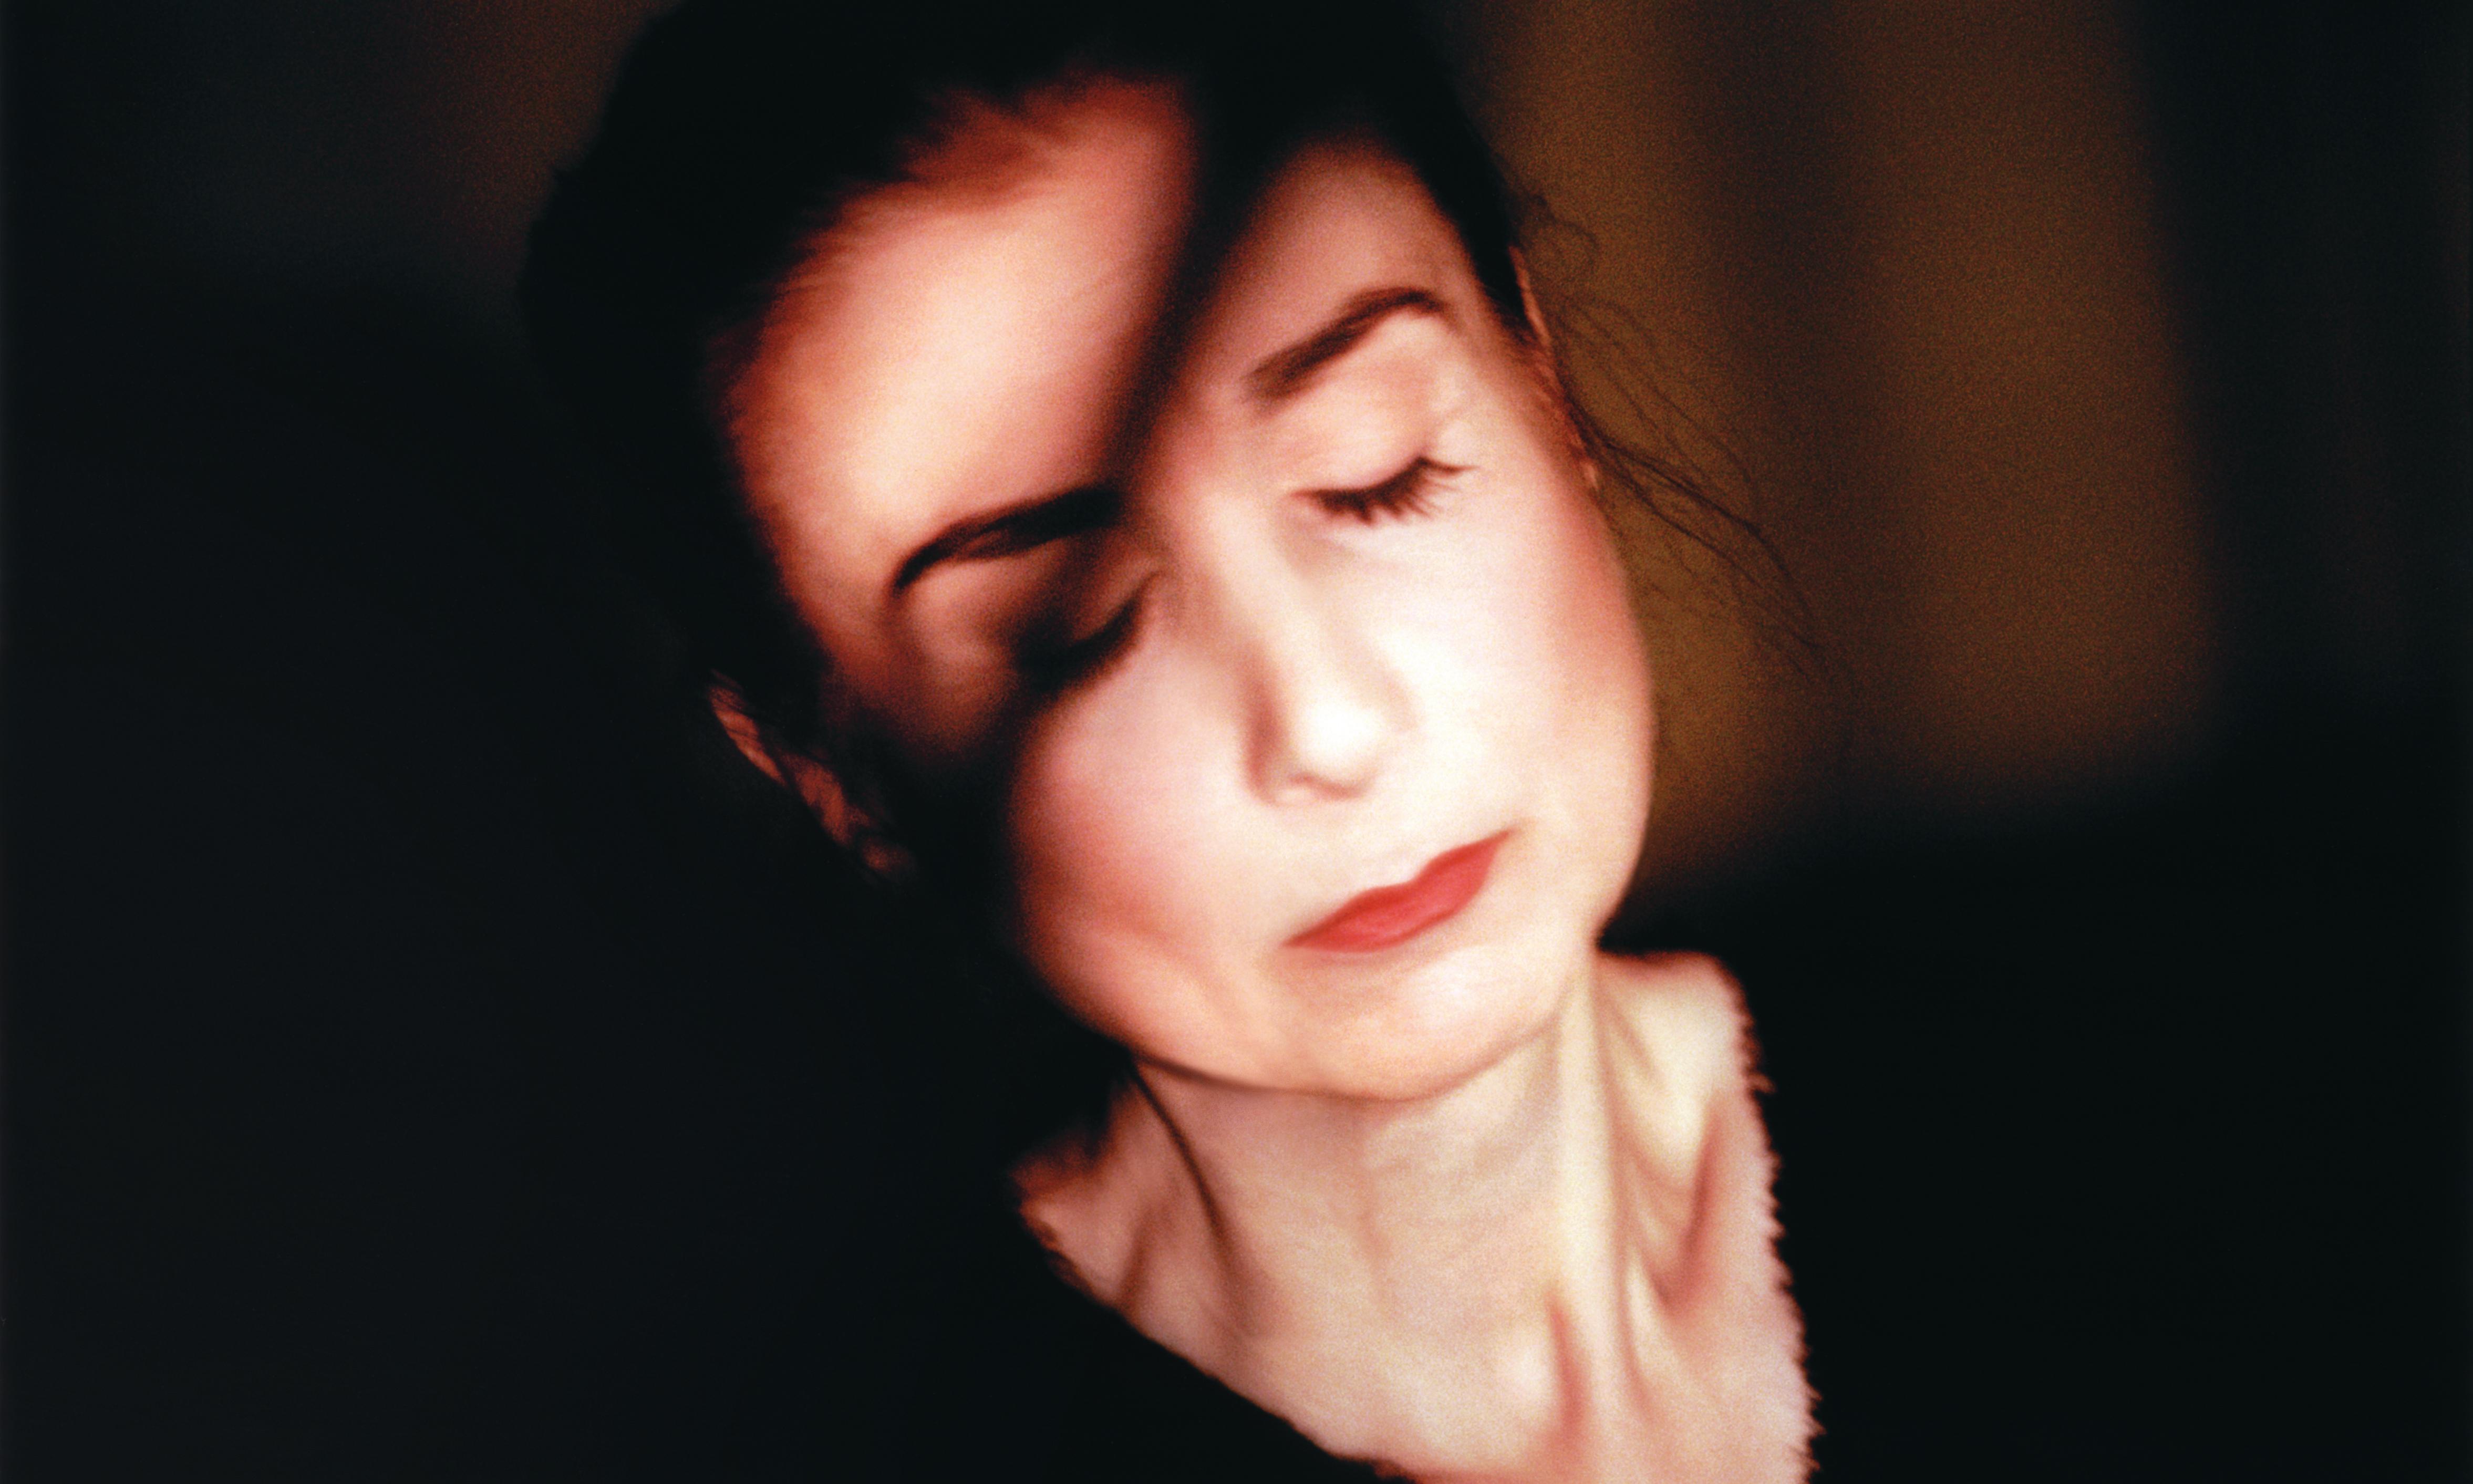 Eva Gray,Shannon Elizabeth Porno pic Felicity Huffman born December 9, 1962 (age 55),Karishma Tanna 2000